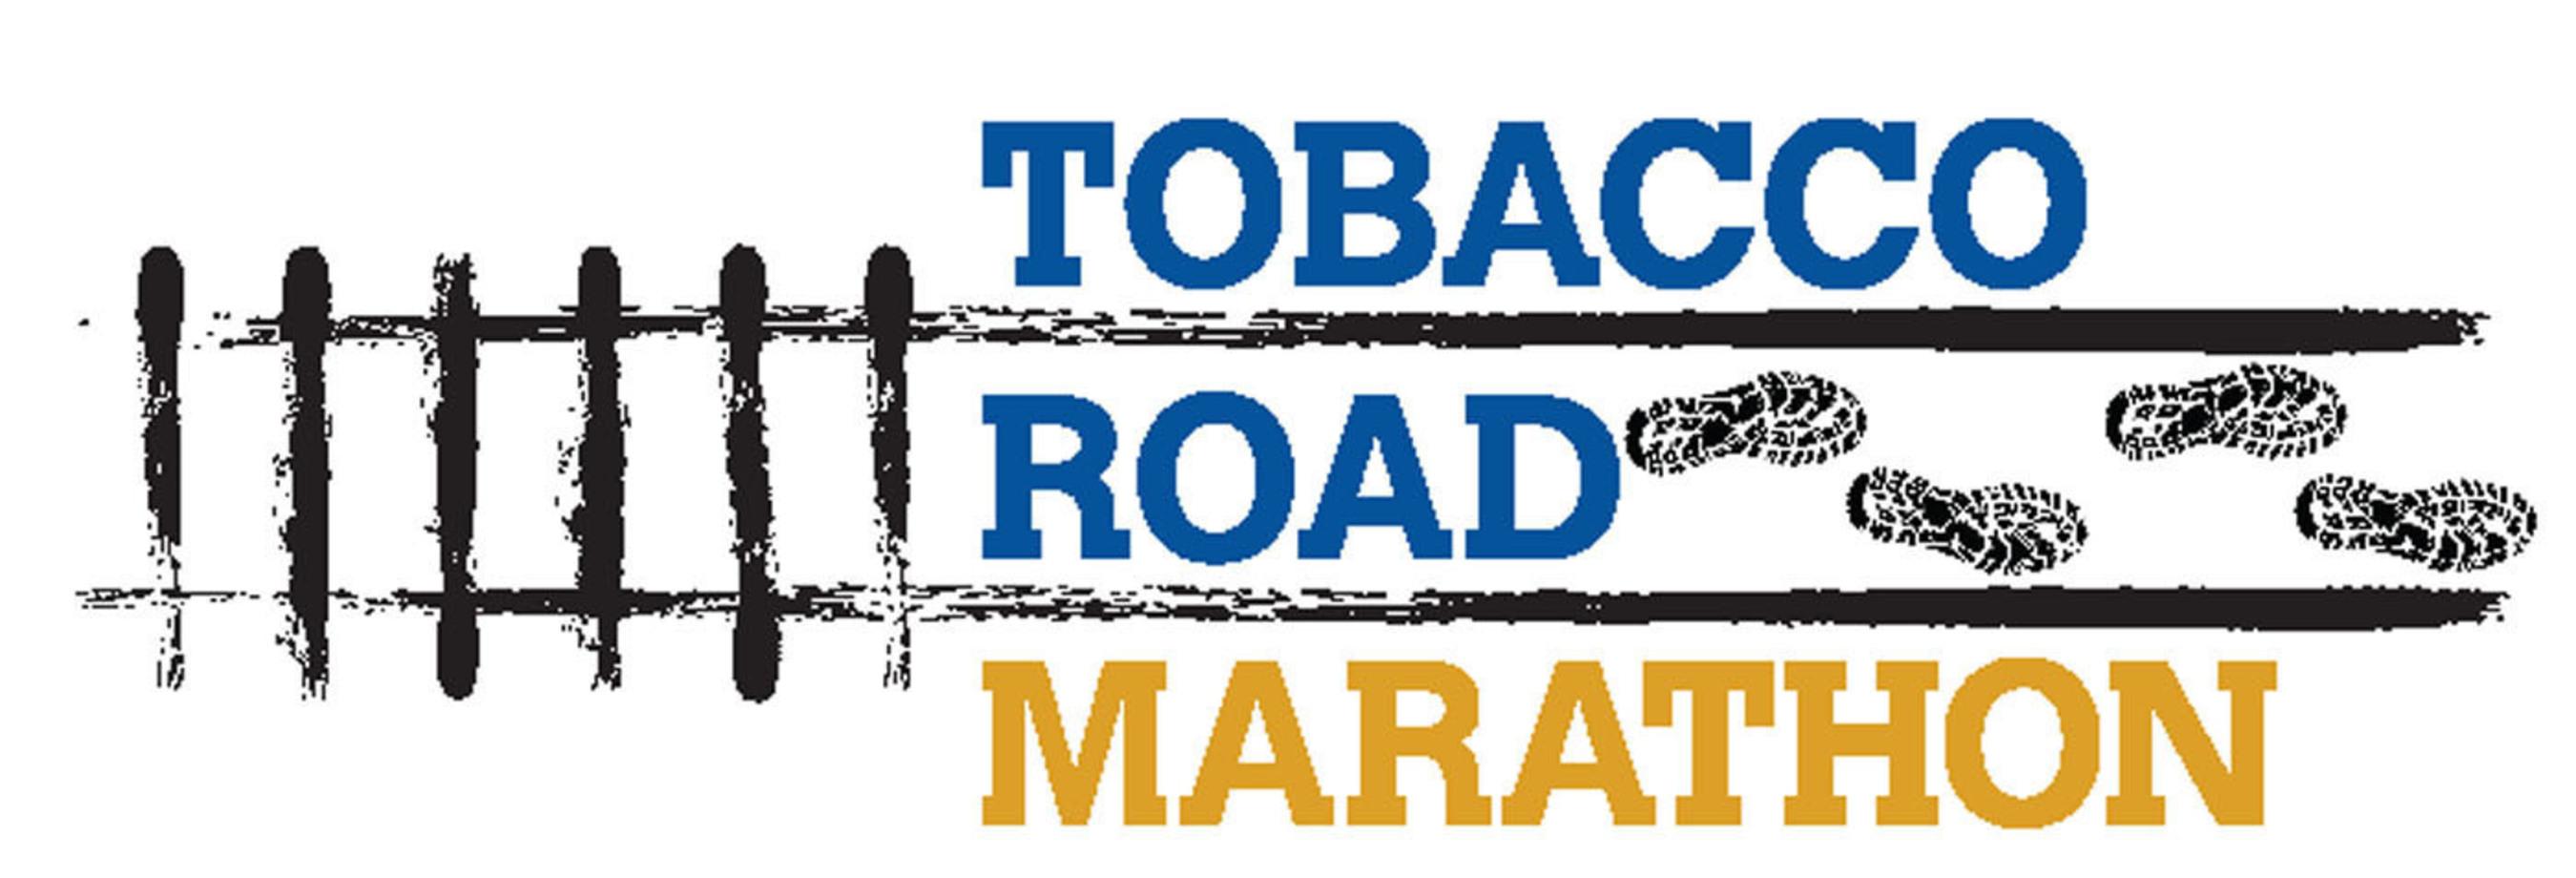 Tobacco Road Marathon  http://tobaccoroadmarathon.com/ . (PRNewsFoto/Tobacco Road Marathon Association (TRMA)) (PRNewsFoto/TRMA) (PRNewsFoto/TRMA)